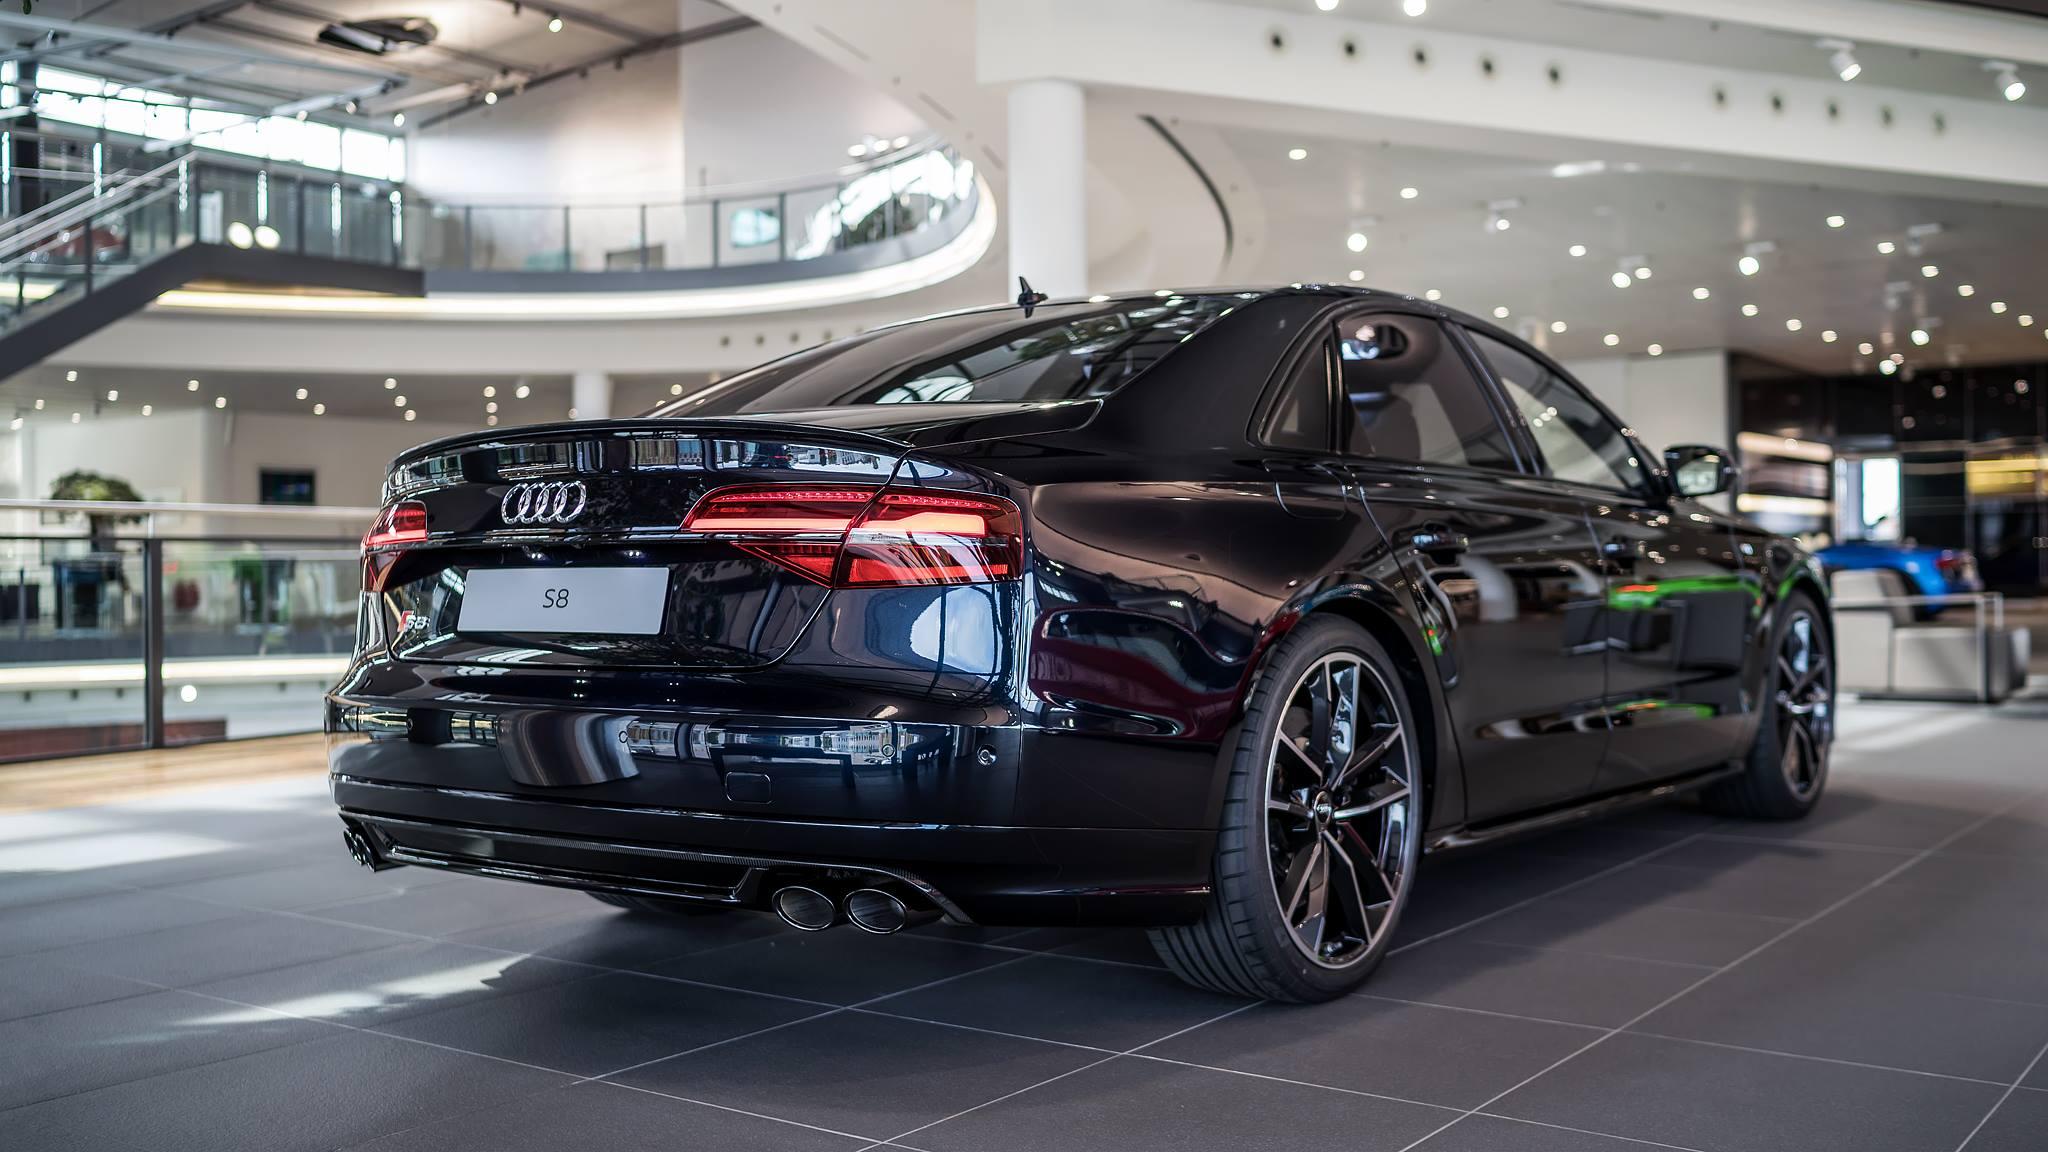 Audi S8 Plus In Carbon Schwarz Metallic Photos